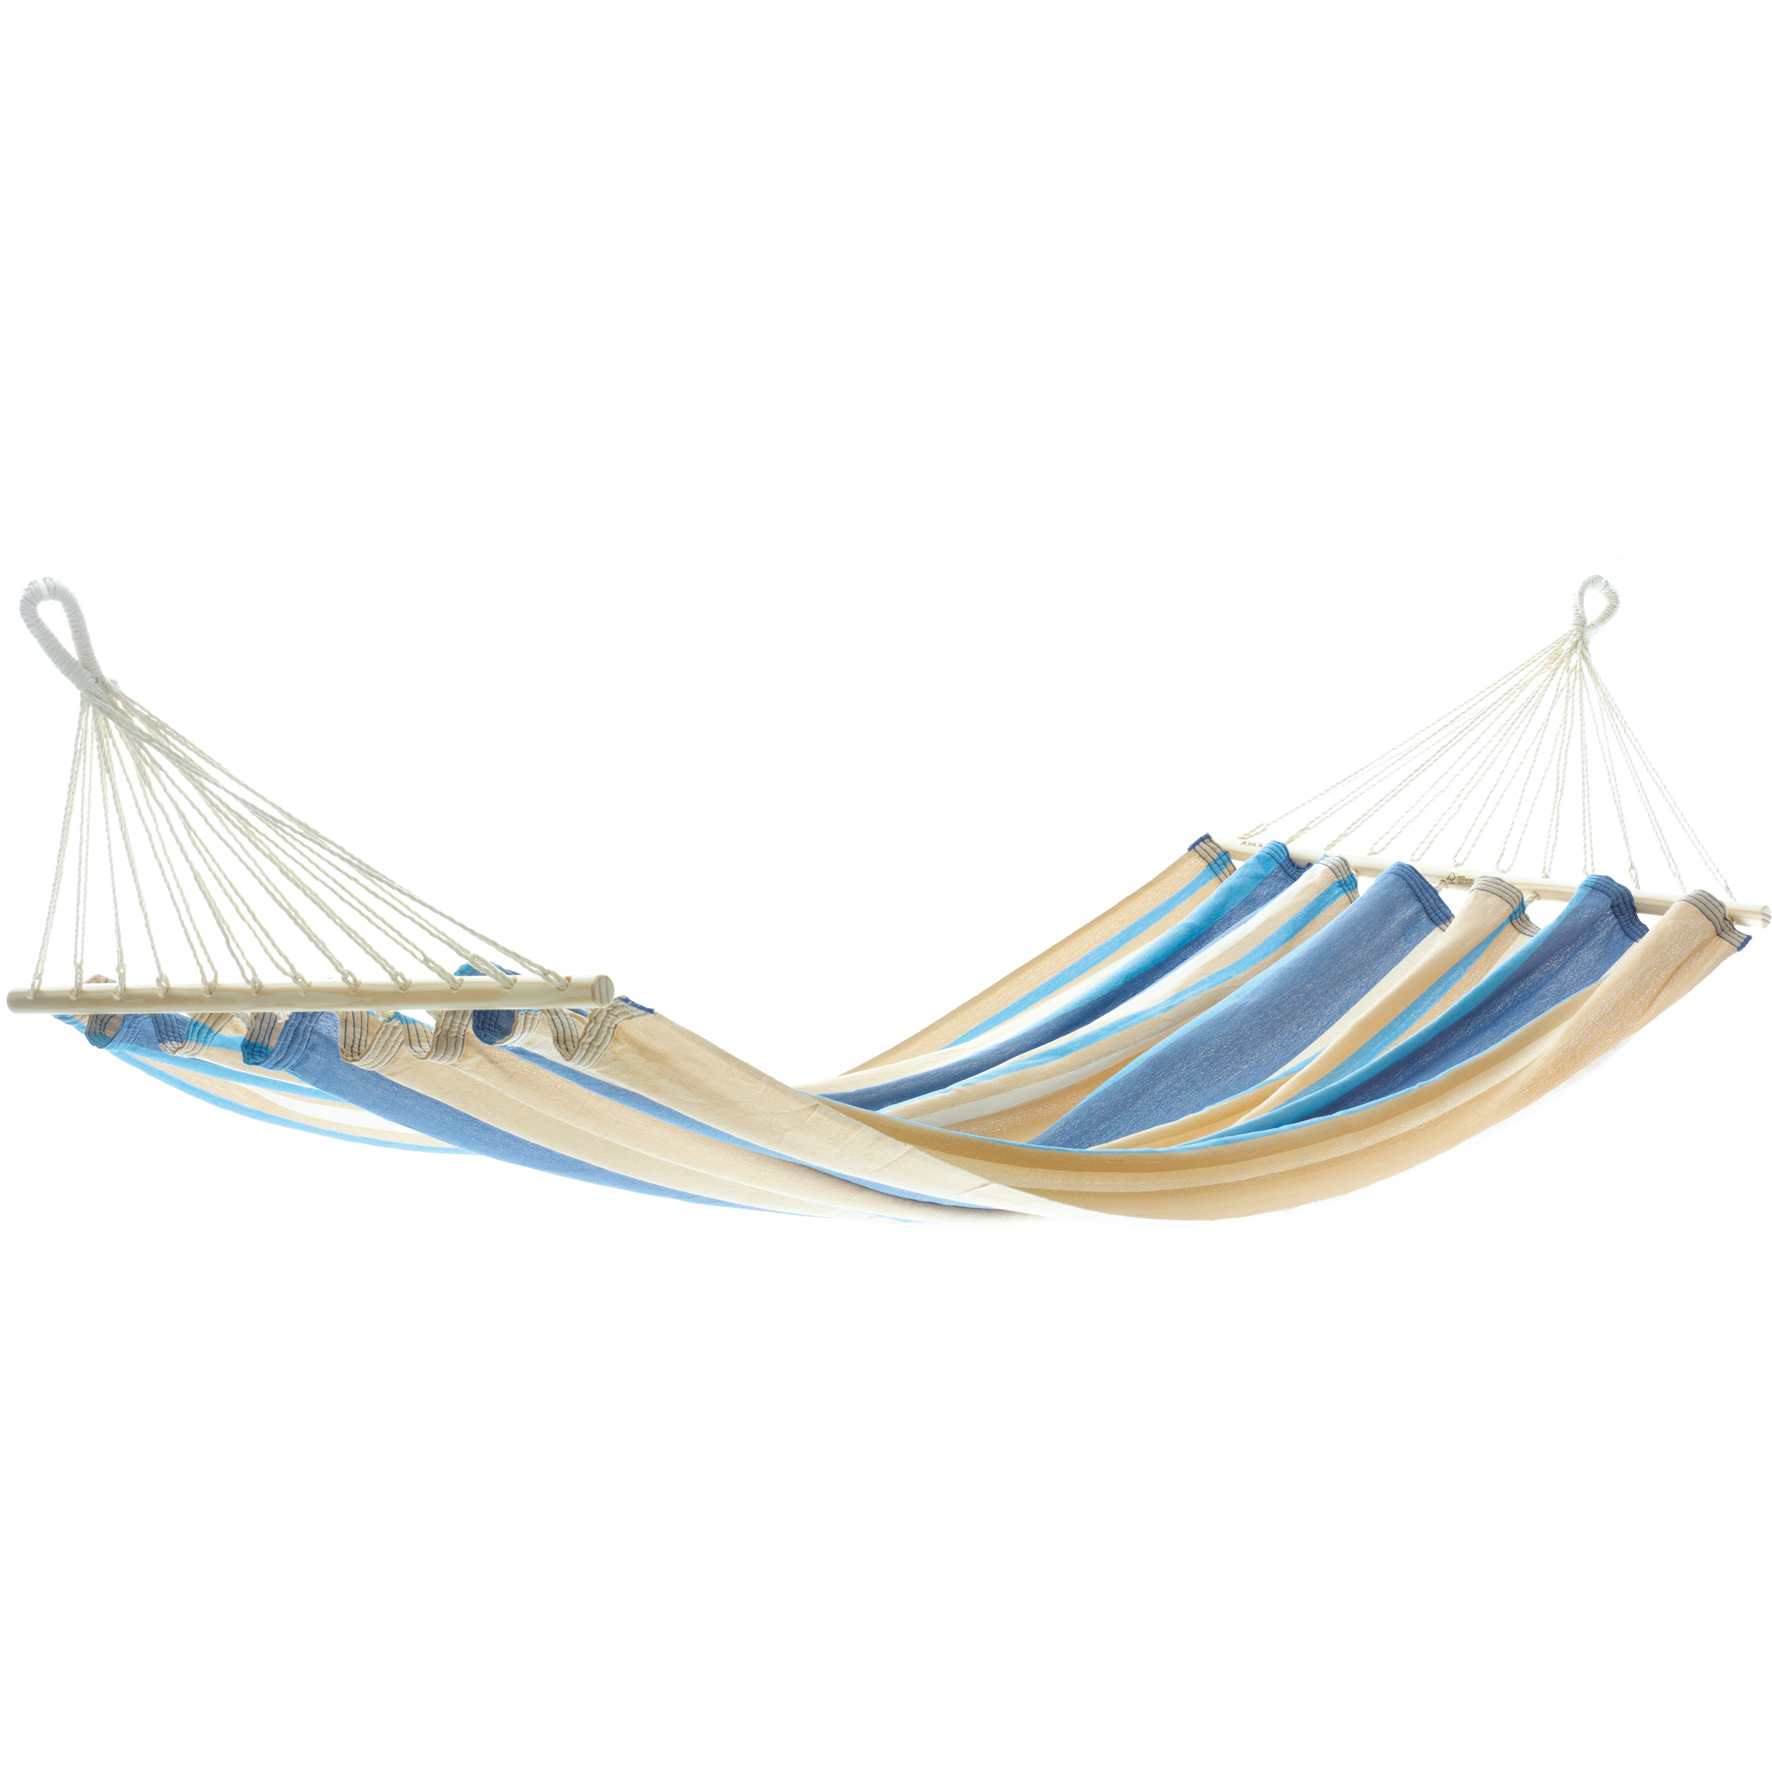 h ngematte miss brasil blau hellblau braun beige von jobek. Black Bedroom Furniture Sets. Home Design Ideas